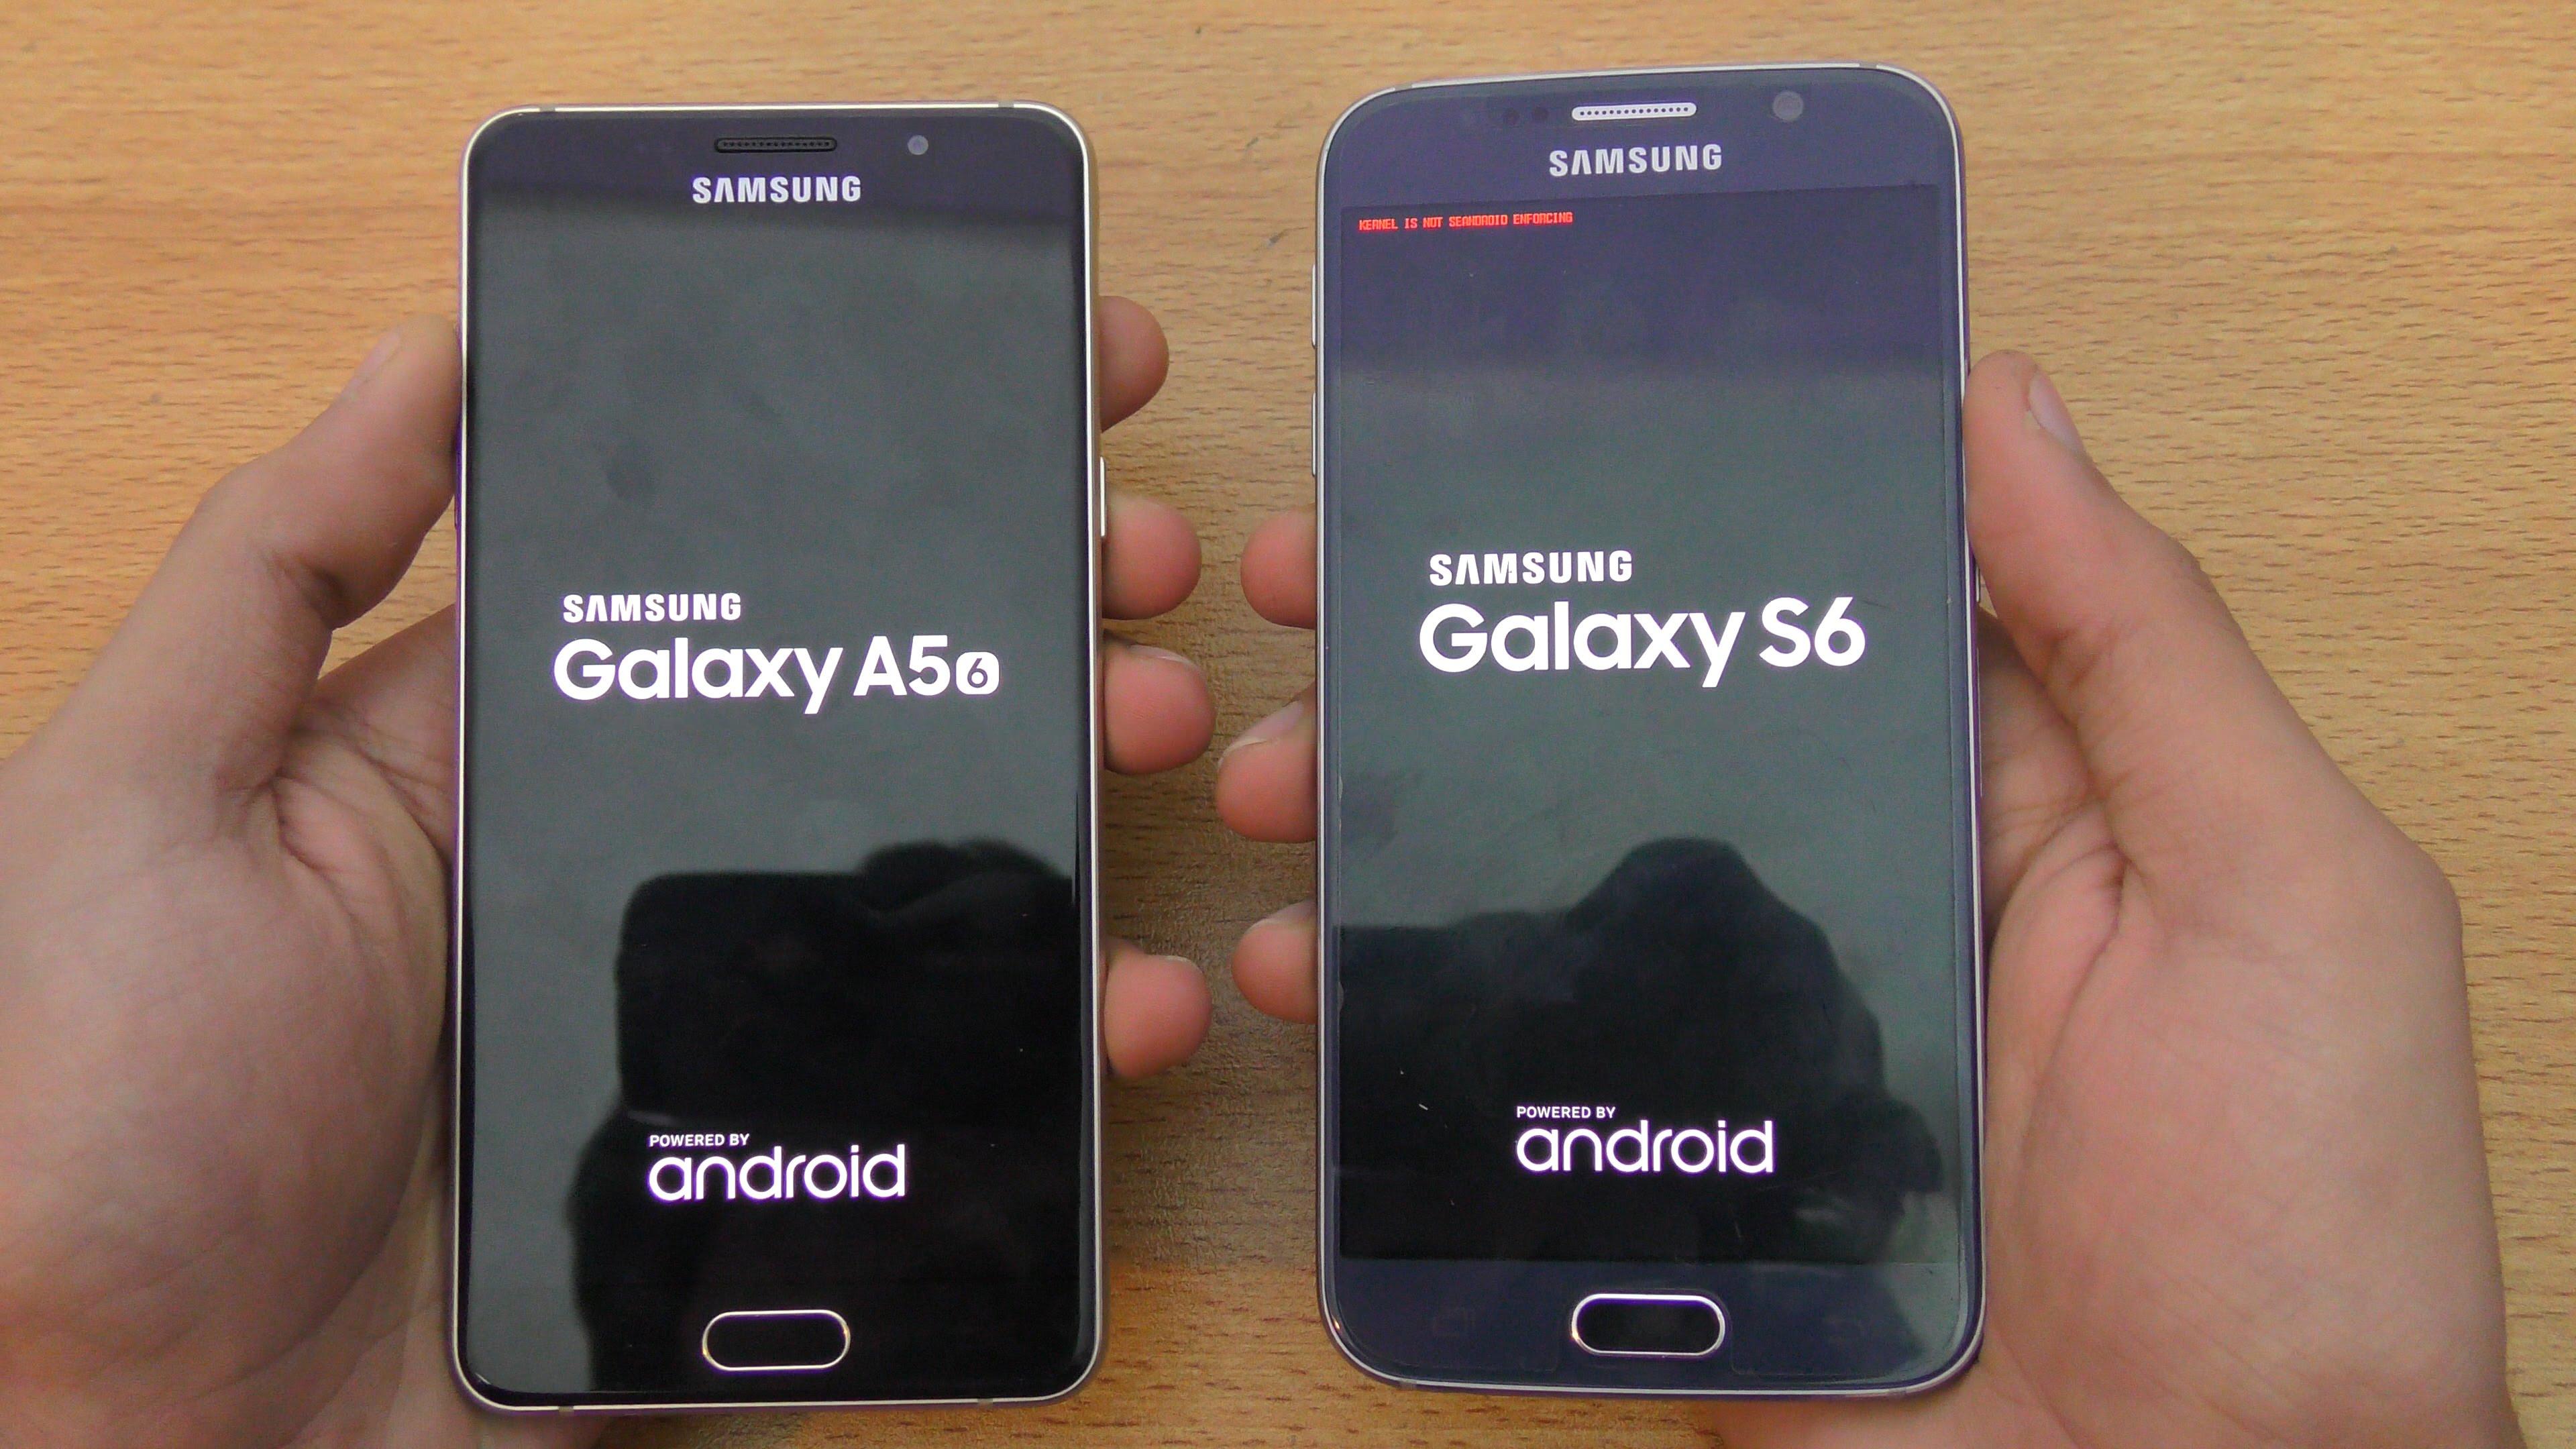 Samsung Galaxy A5 A7 A9 Galaxy J5 C5 C7 Nougat Update